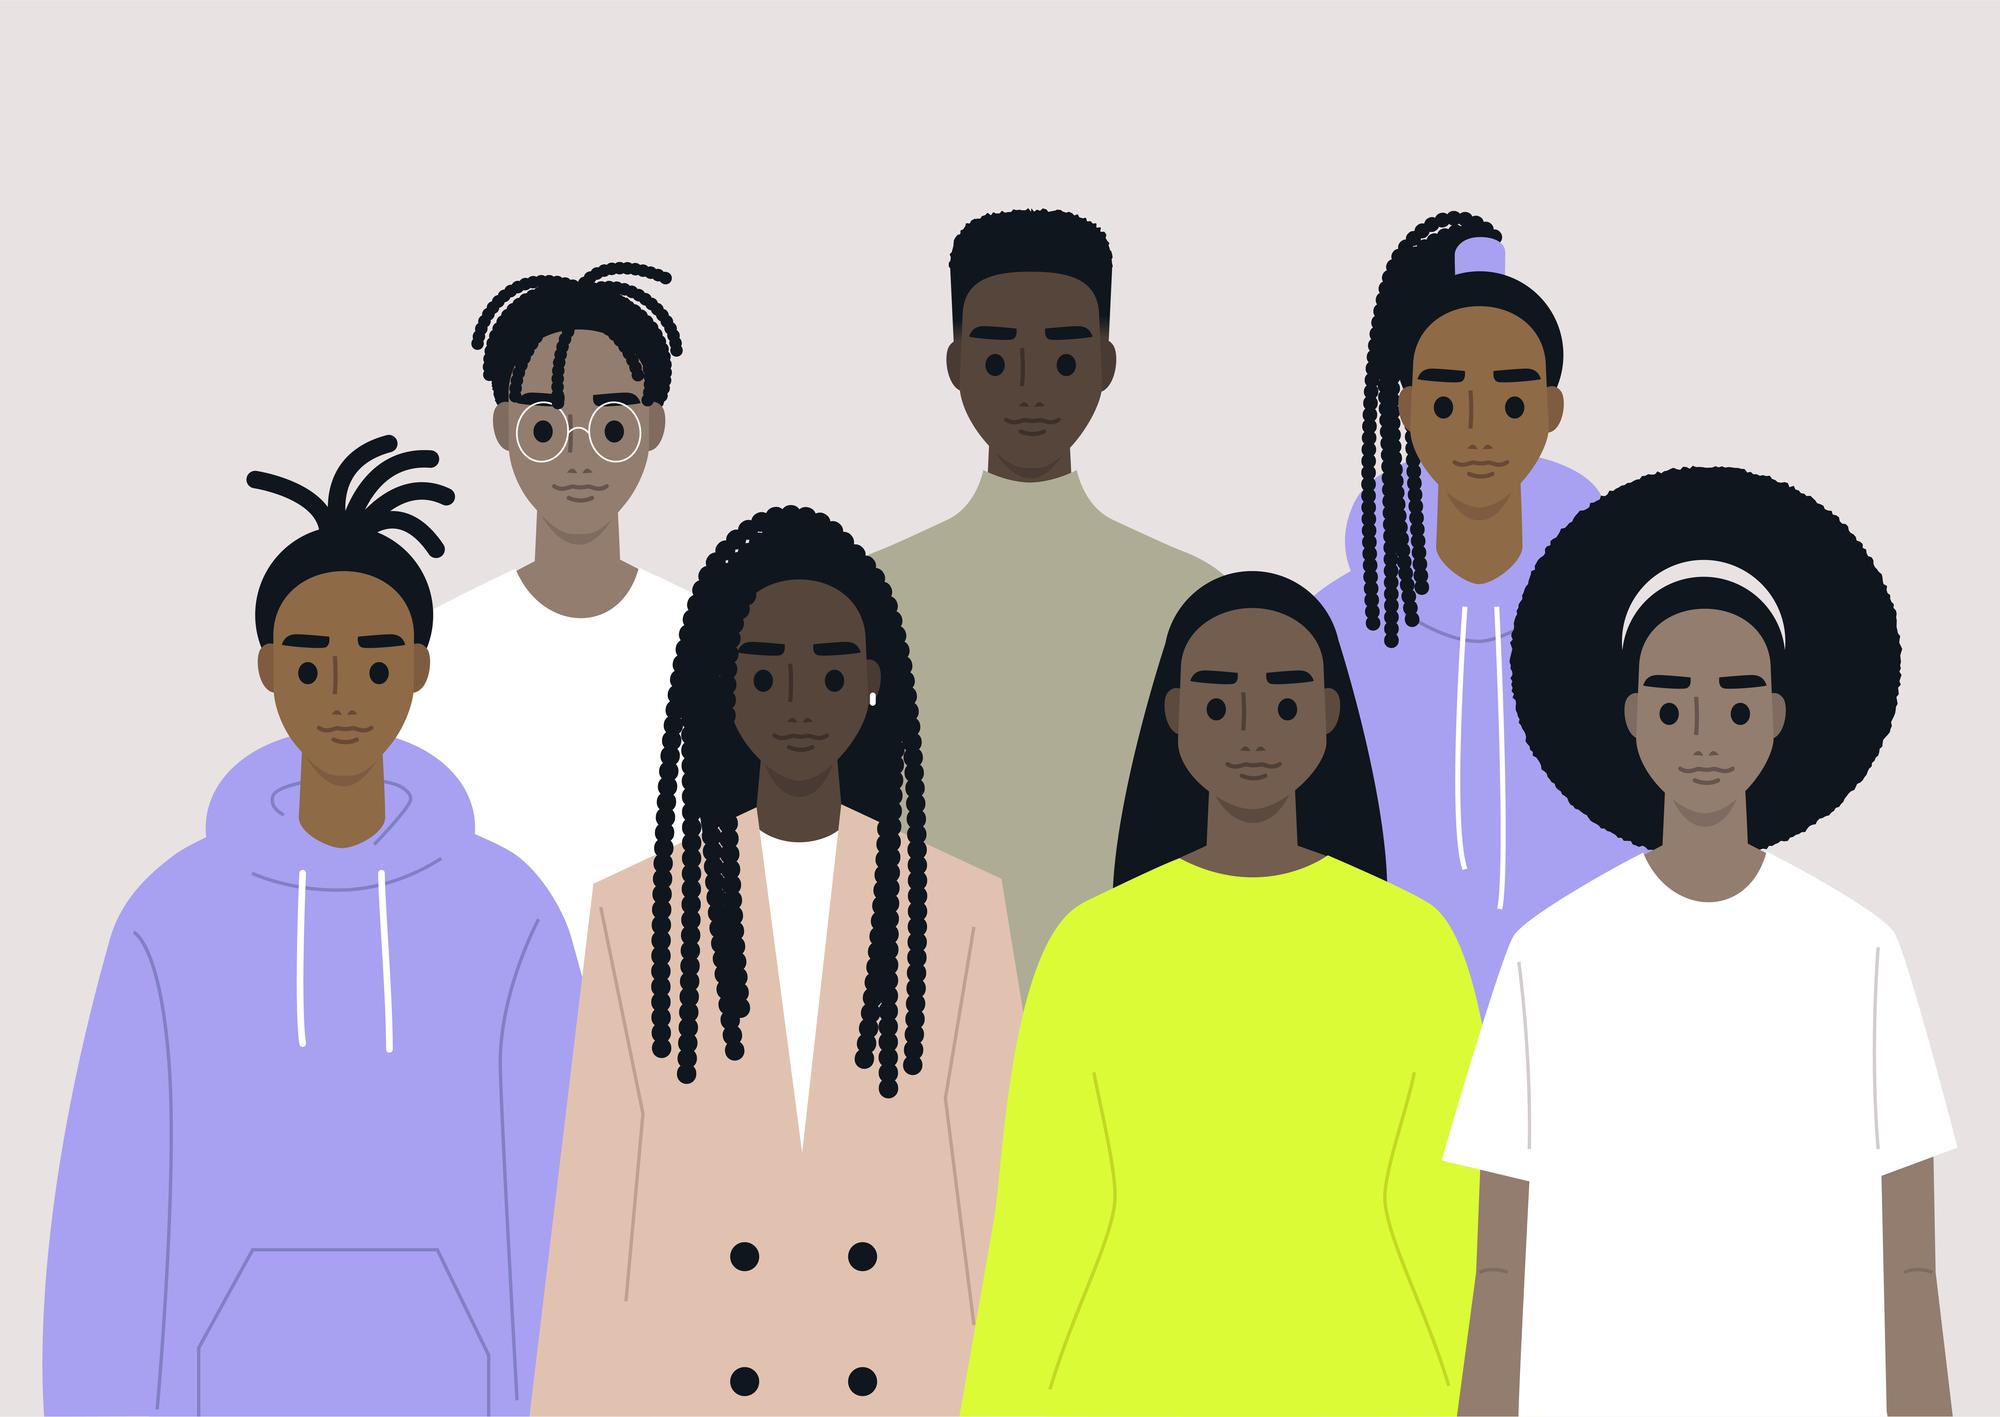 Black community stock illustration